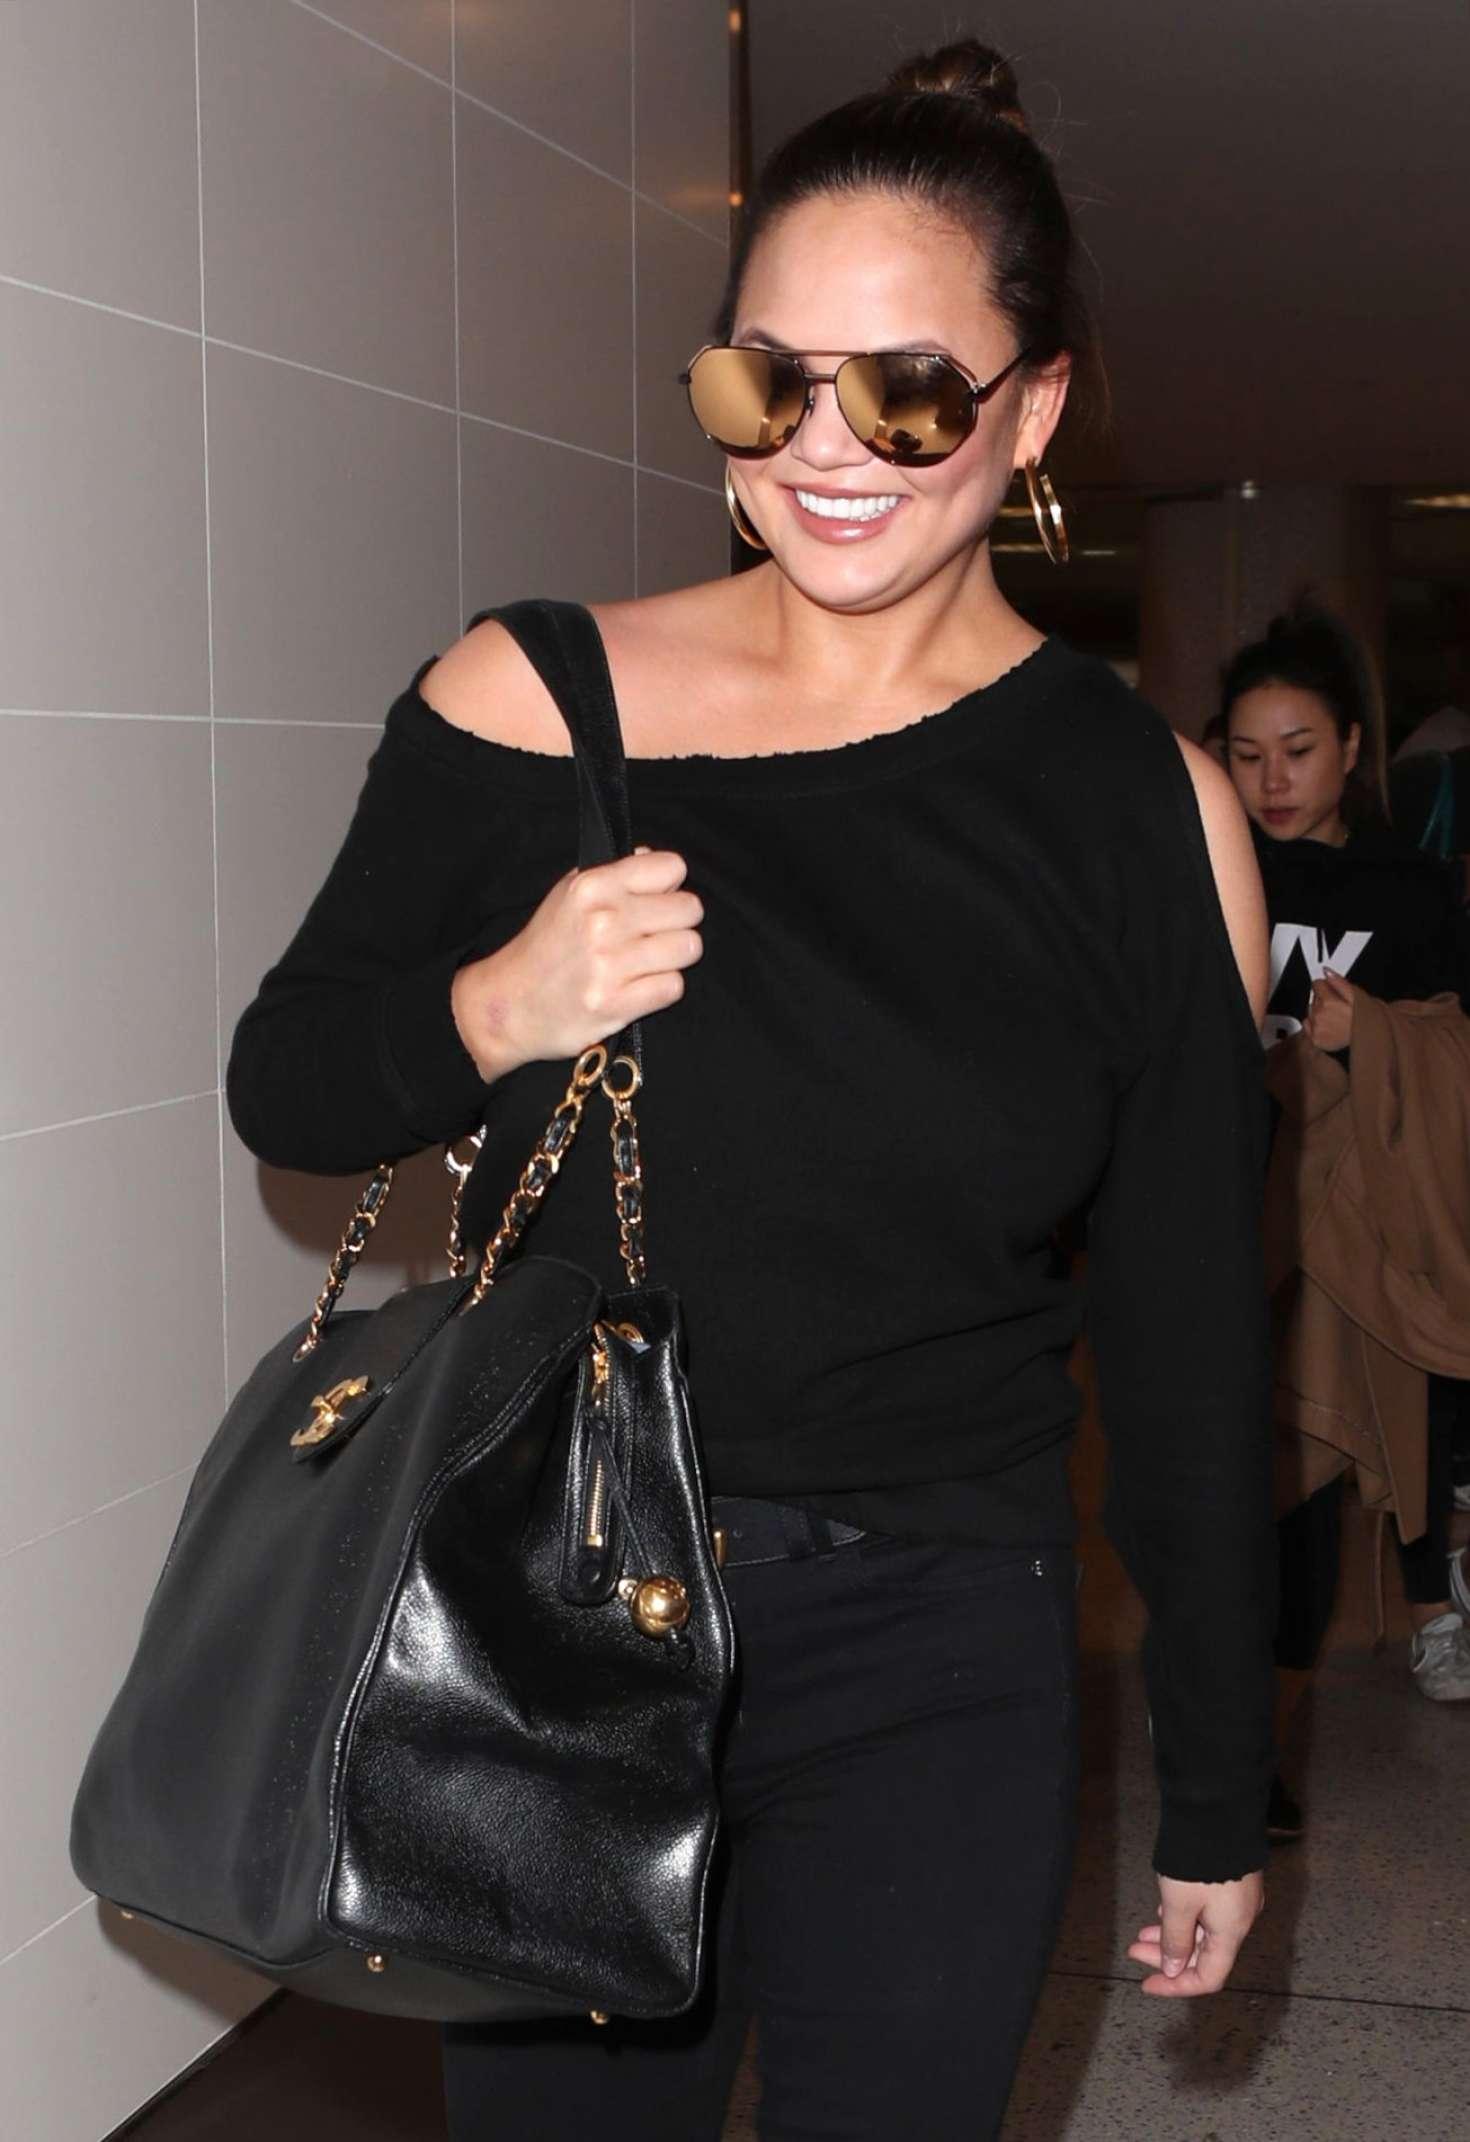 Chrissy Teigen 2015 : Chrissy Teigen: Arrives at LAX Airport -06